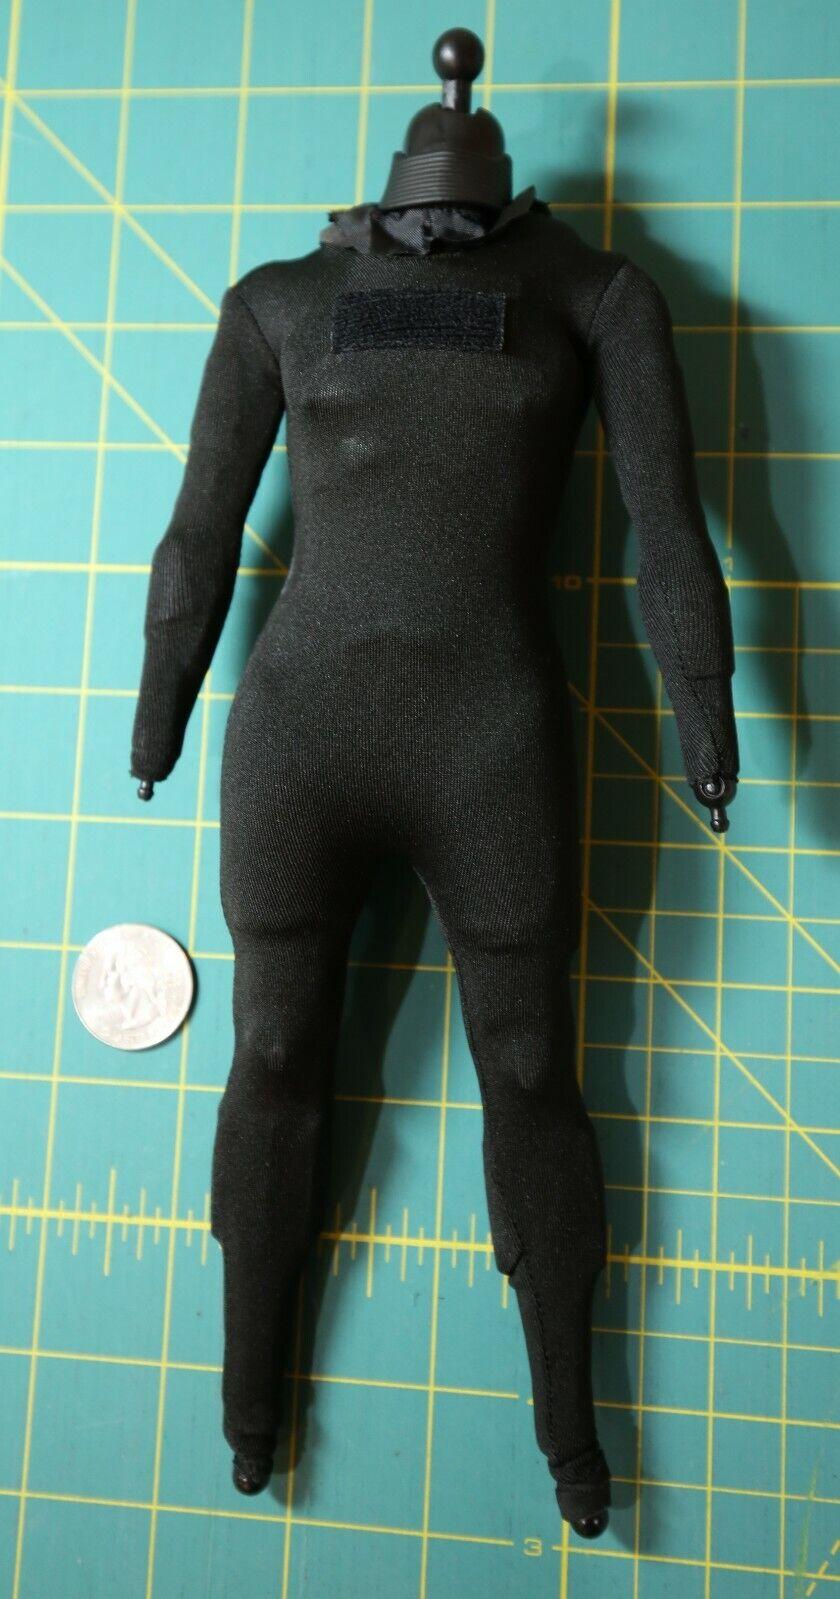 Hot Toys 1 6 MMS514 MMS515 Stormtrooper Body, Bodysuit & Pegs Return of the Jedi